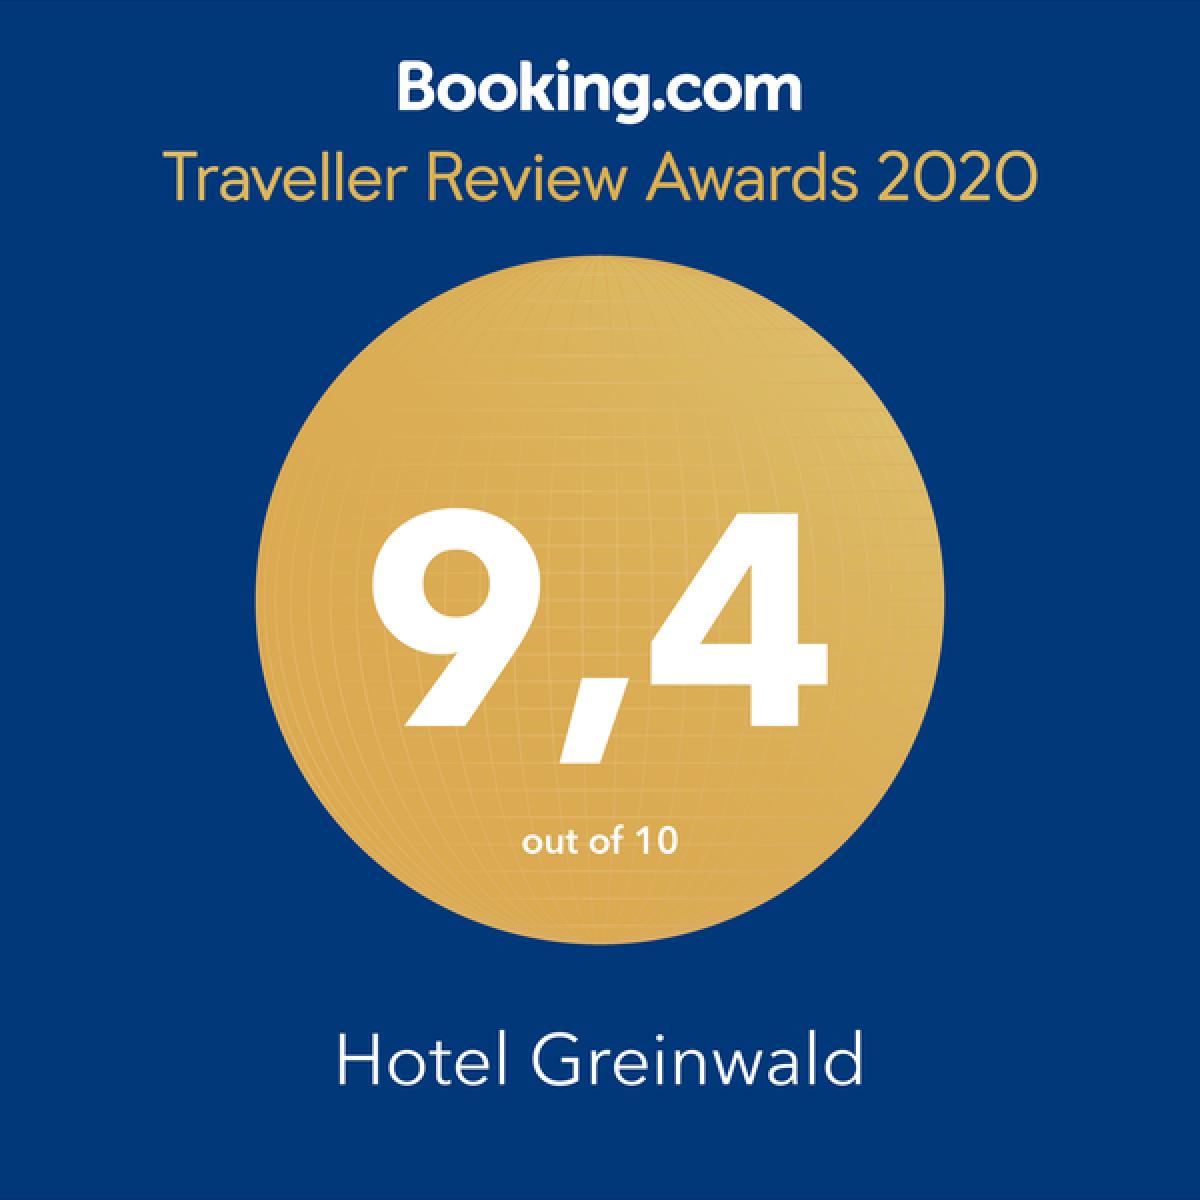 Booking.com Traveler's Award - Hotel Greinwald